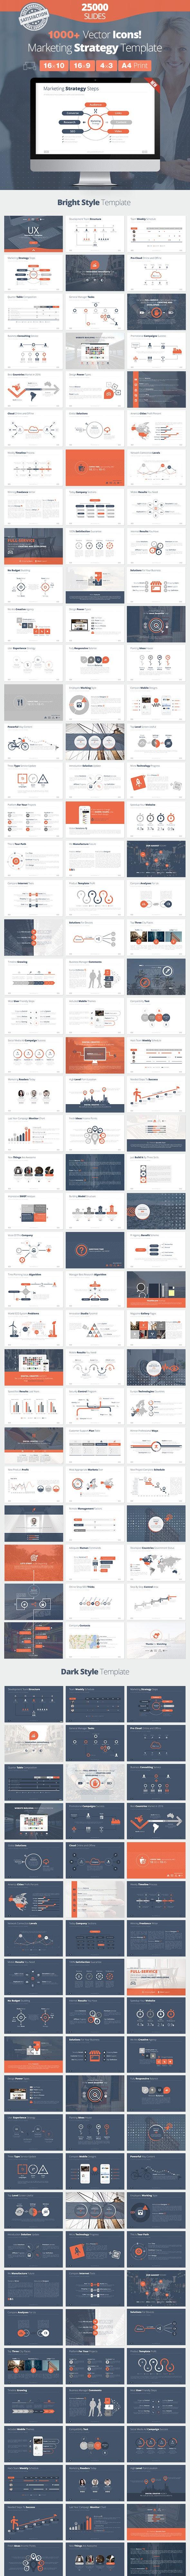 Marketing Strategy Presentation for Keynote - Business Keynote Templates